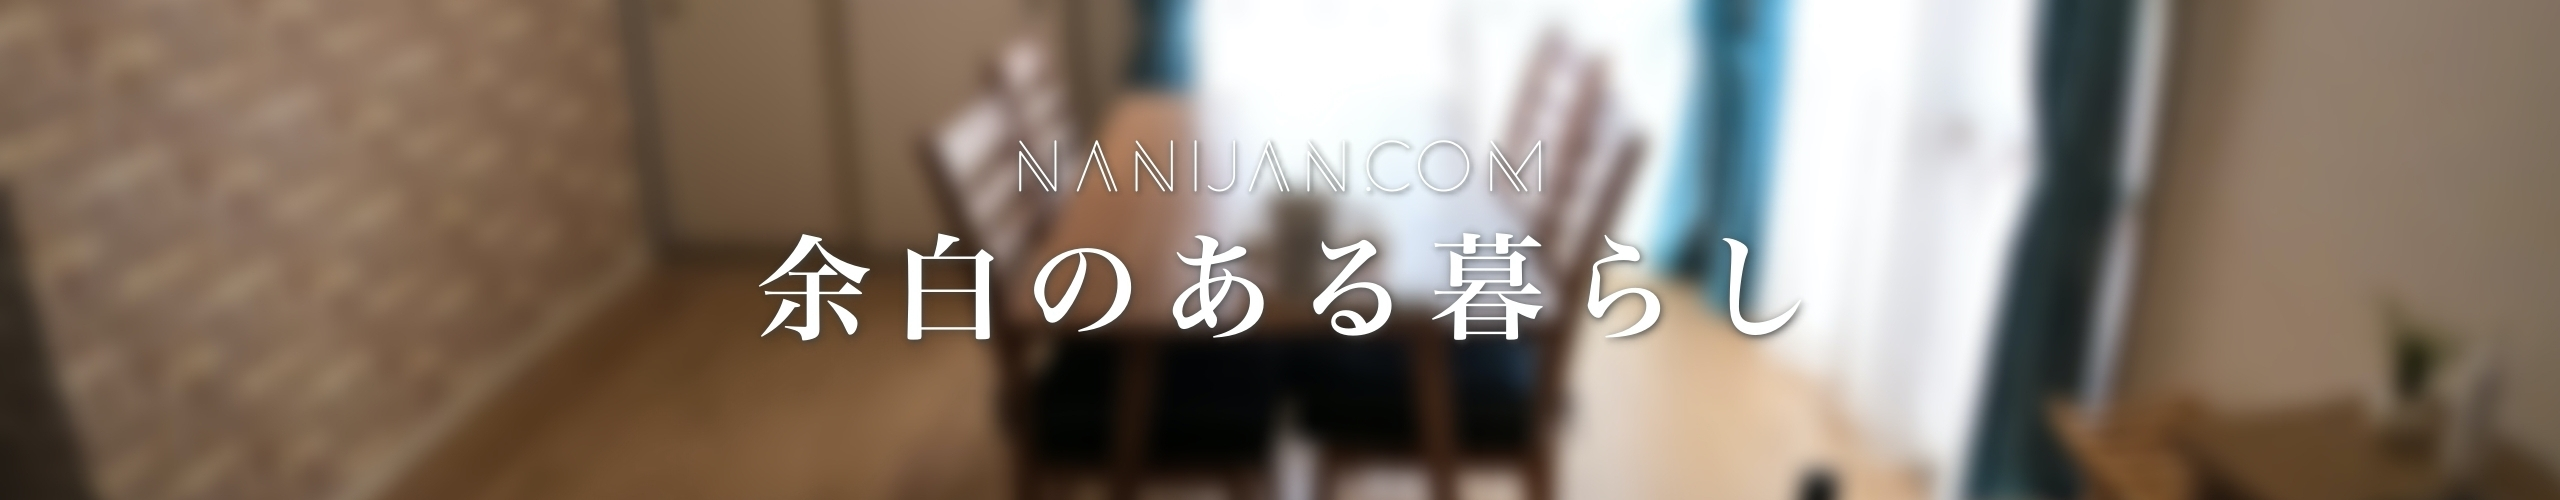 nani-jan.com | 余白のある暮らし